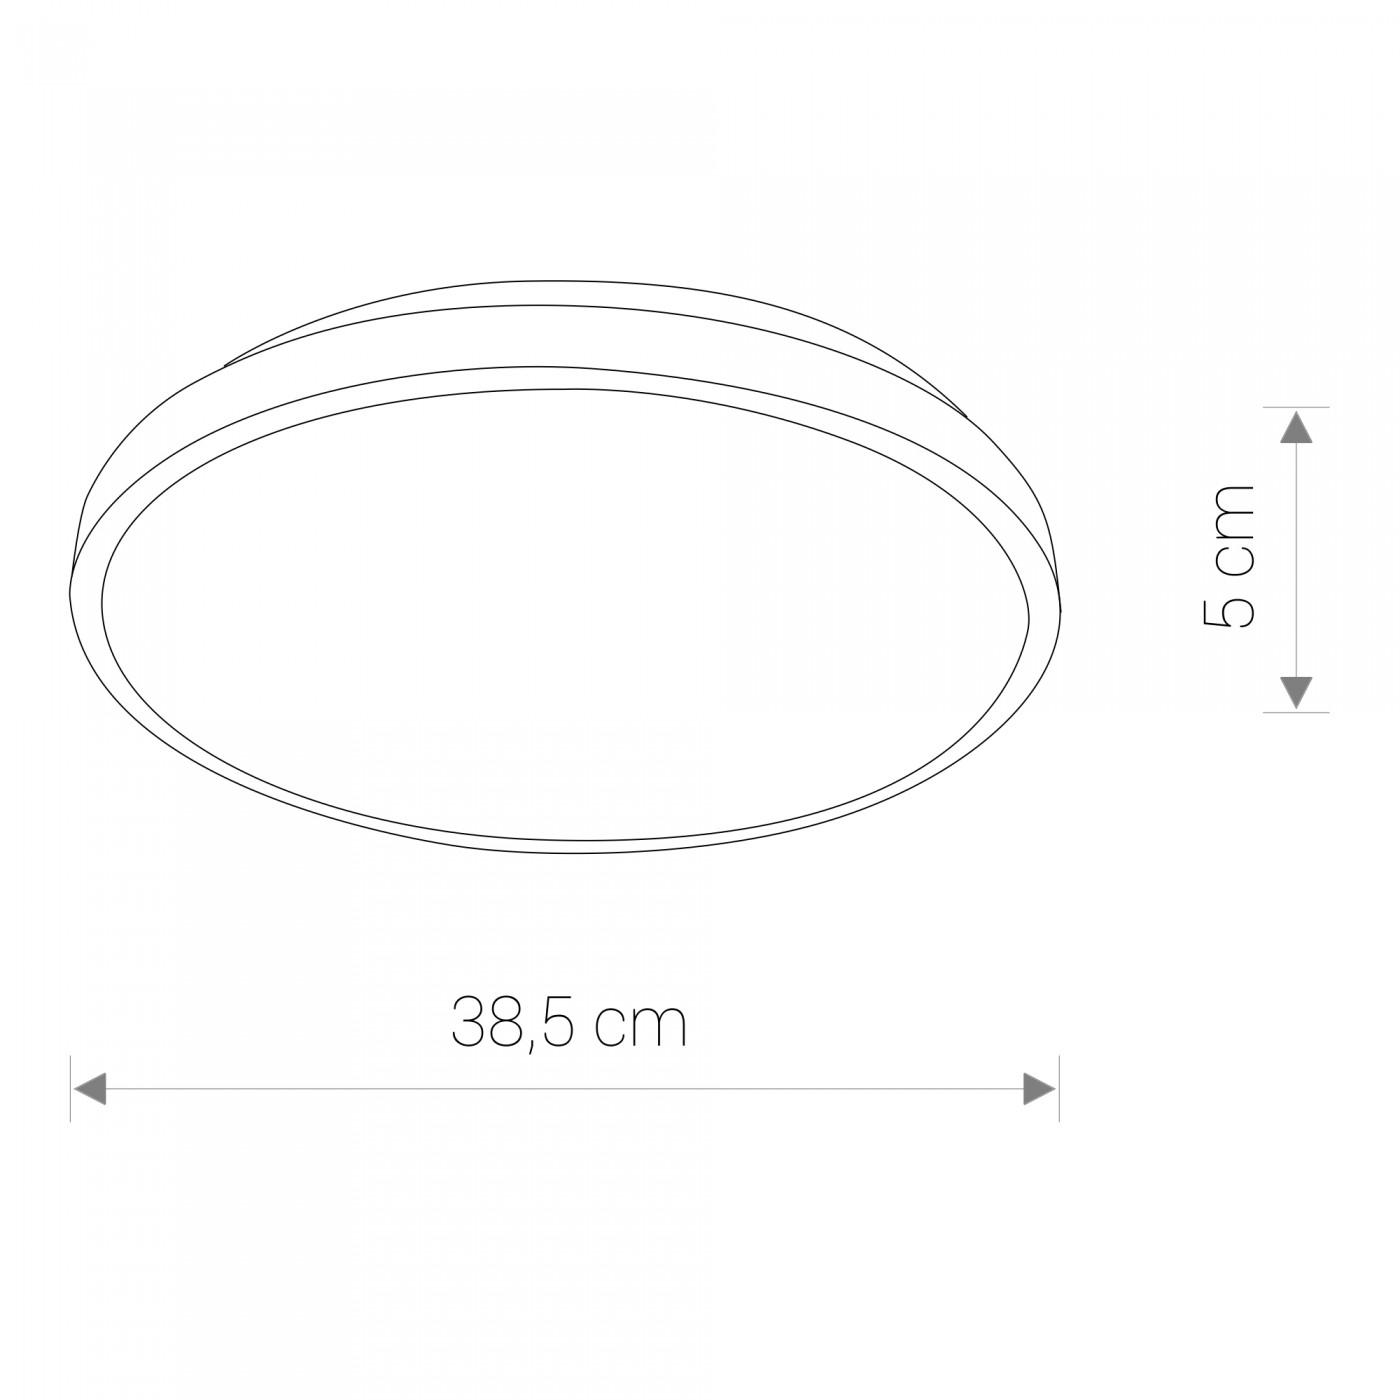 Nowodvorski TL-8186 Agnes Round LED víz-védett mennyezeti lámpa